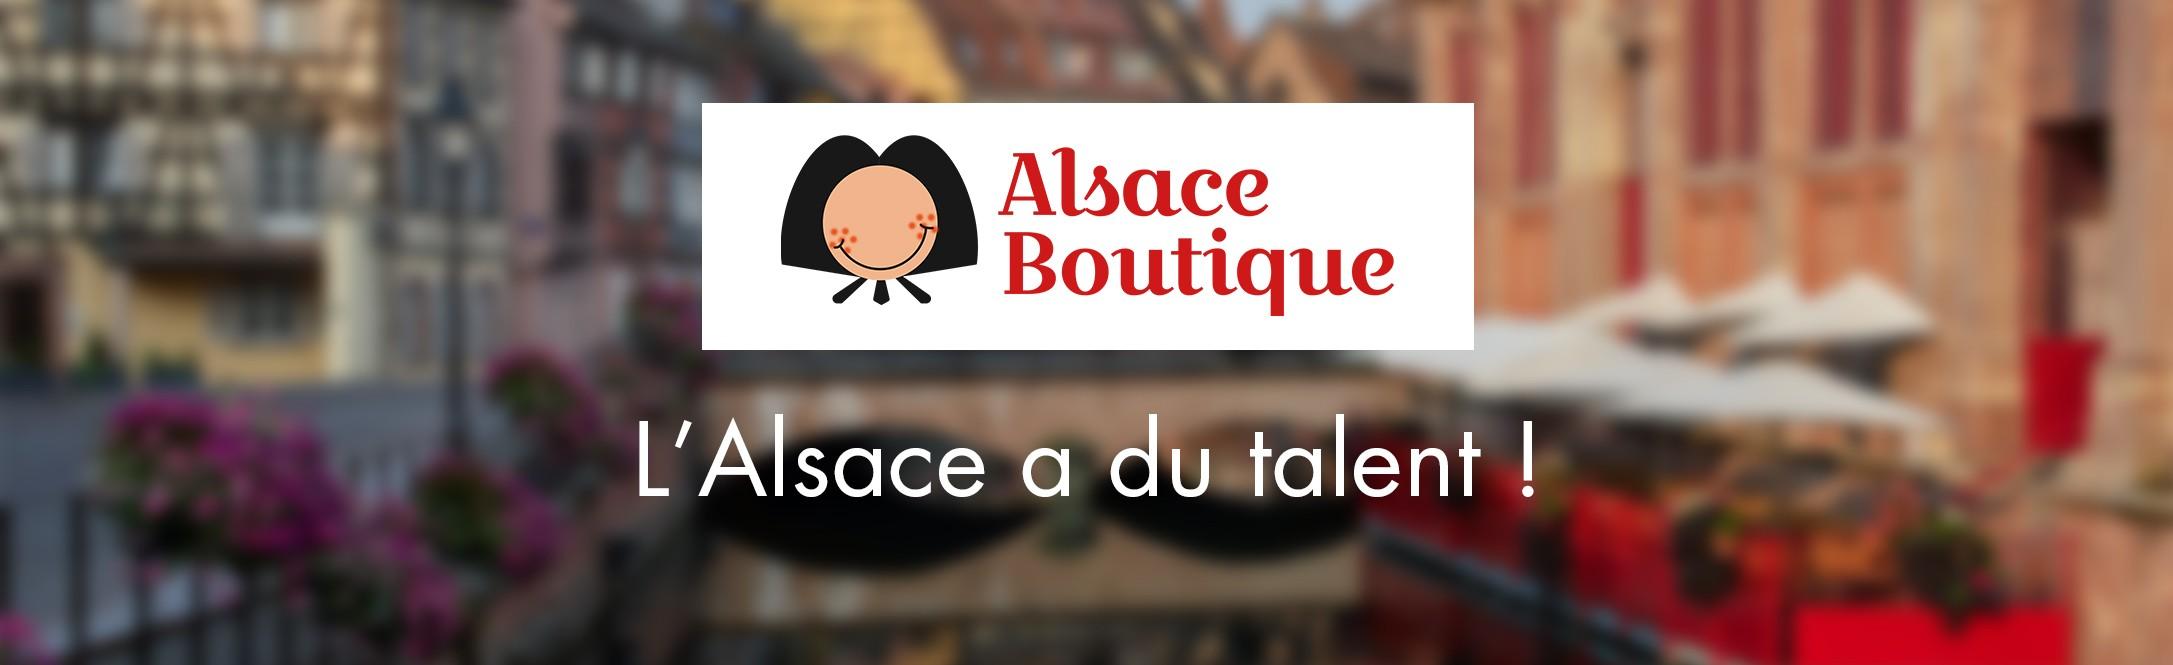 Alsace Boutique - Bernhard Gross - Artiste Alsacien - Eguisheim